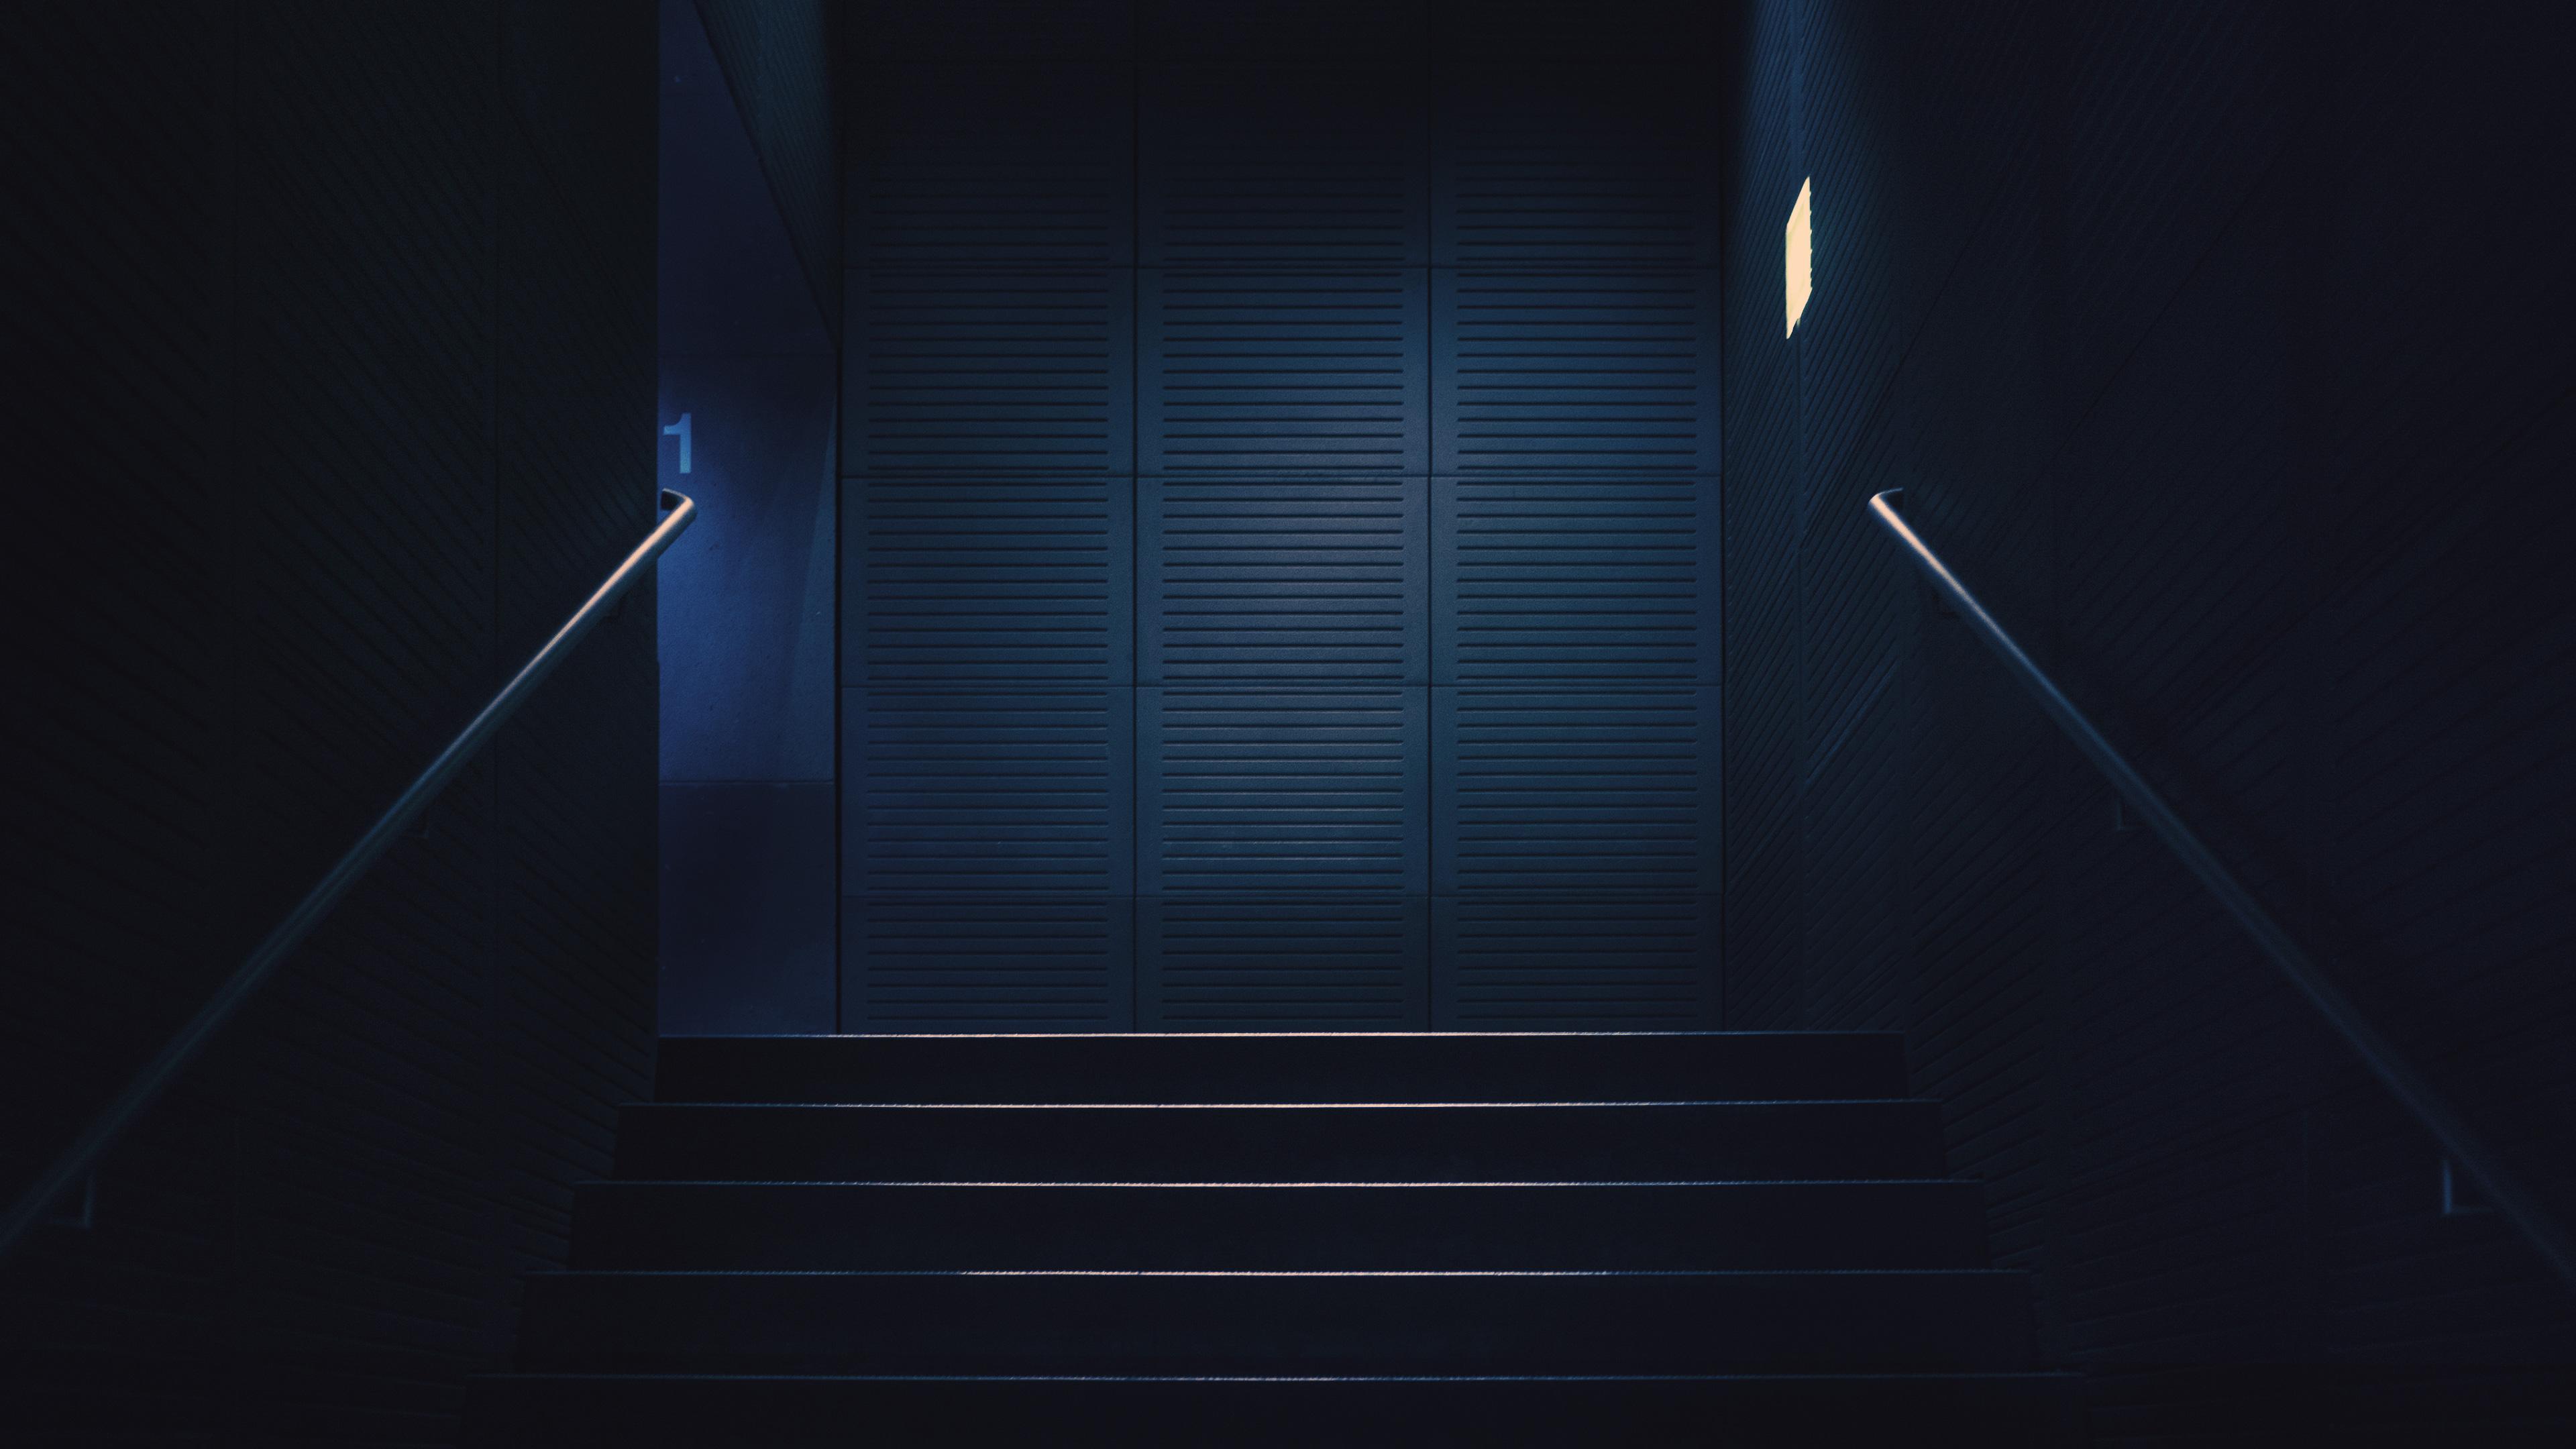 Stairway Dark Lights Minimalism 4k Hd Artist 4k Wallpapers